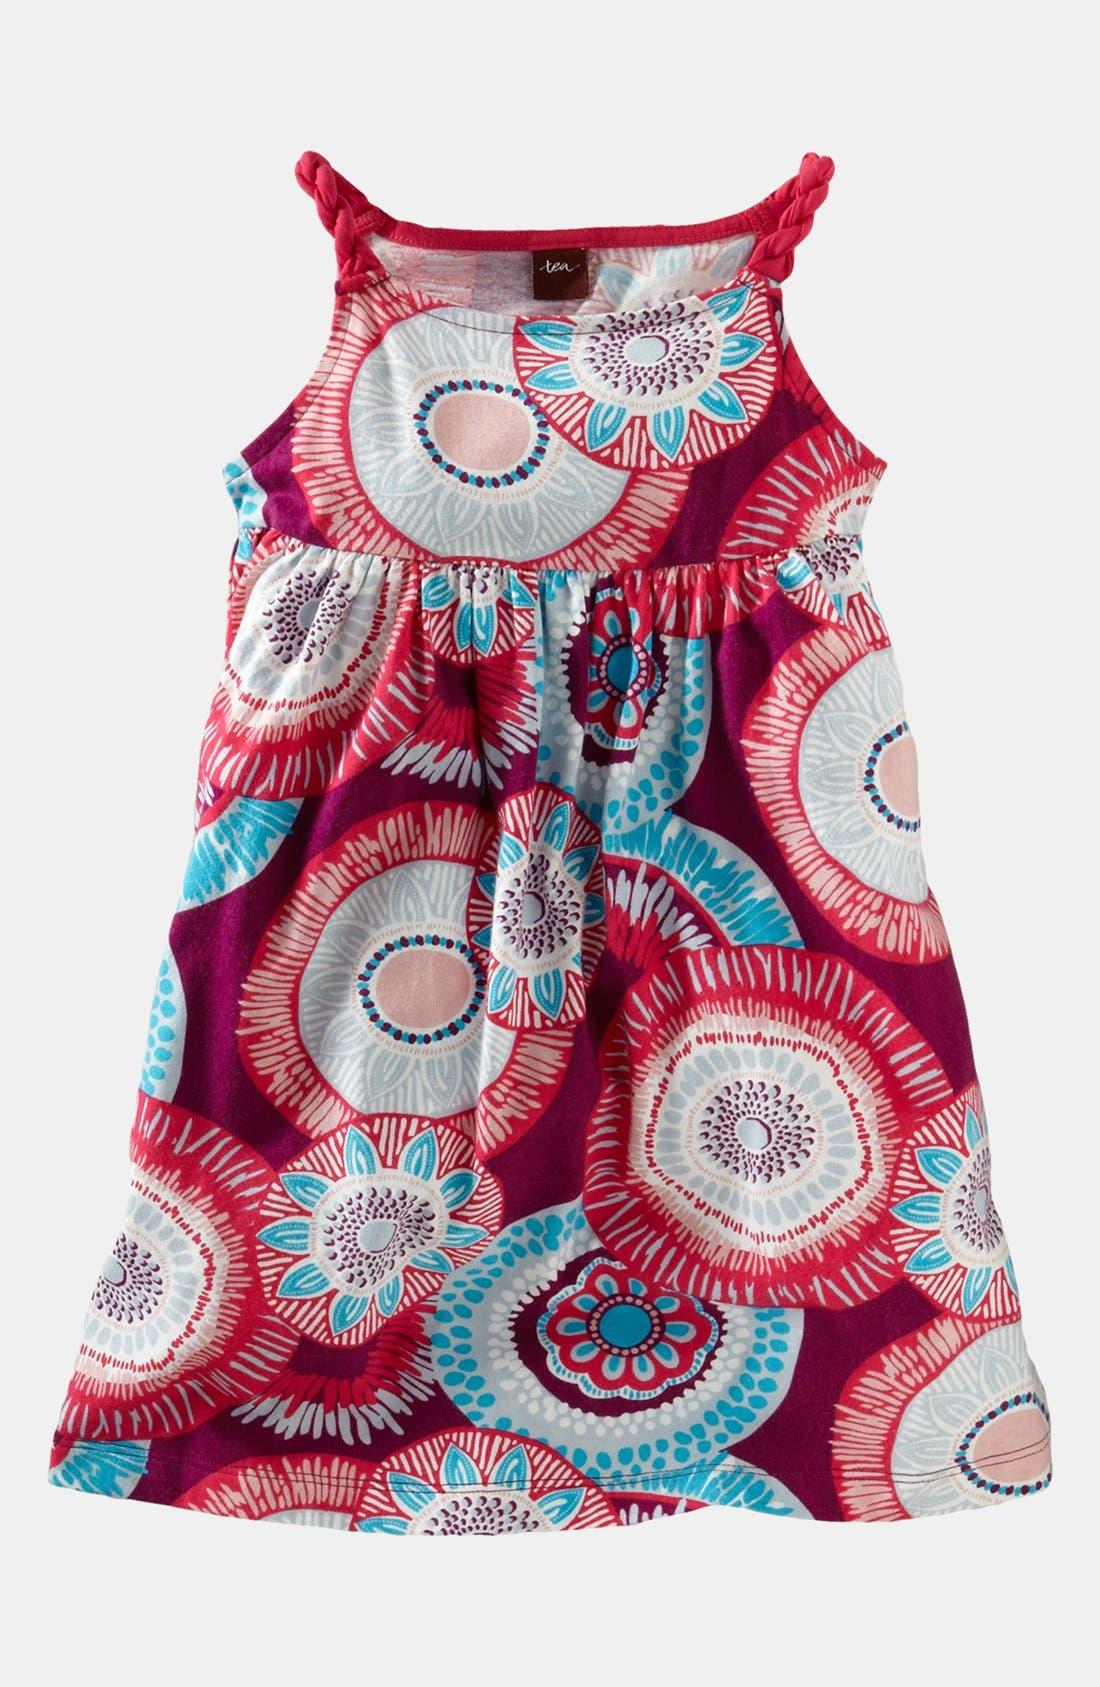 Alternate Image 1 Selected - Tea Collection 'Nova Twist' Dress (Little Girls & Big Girls)